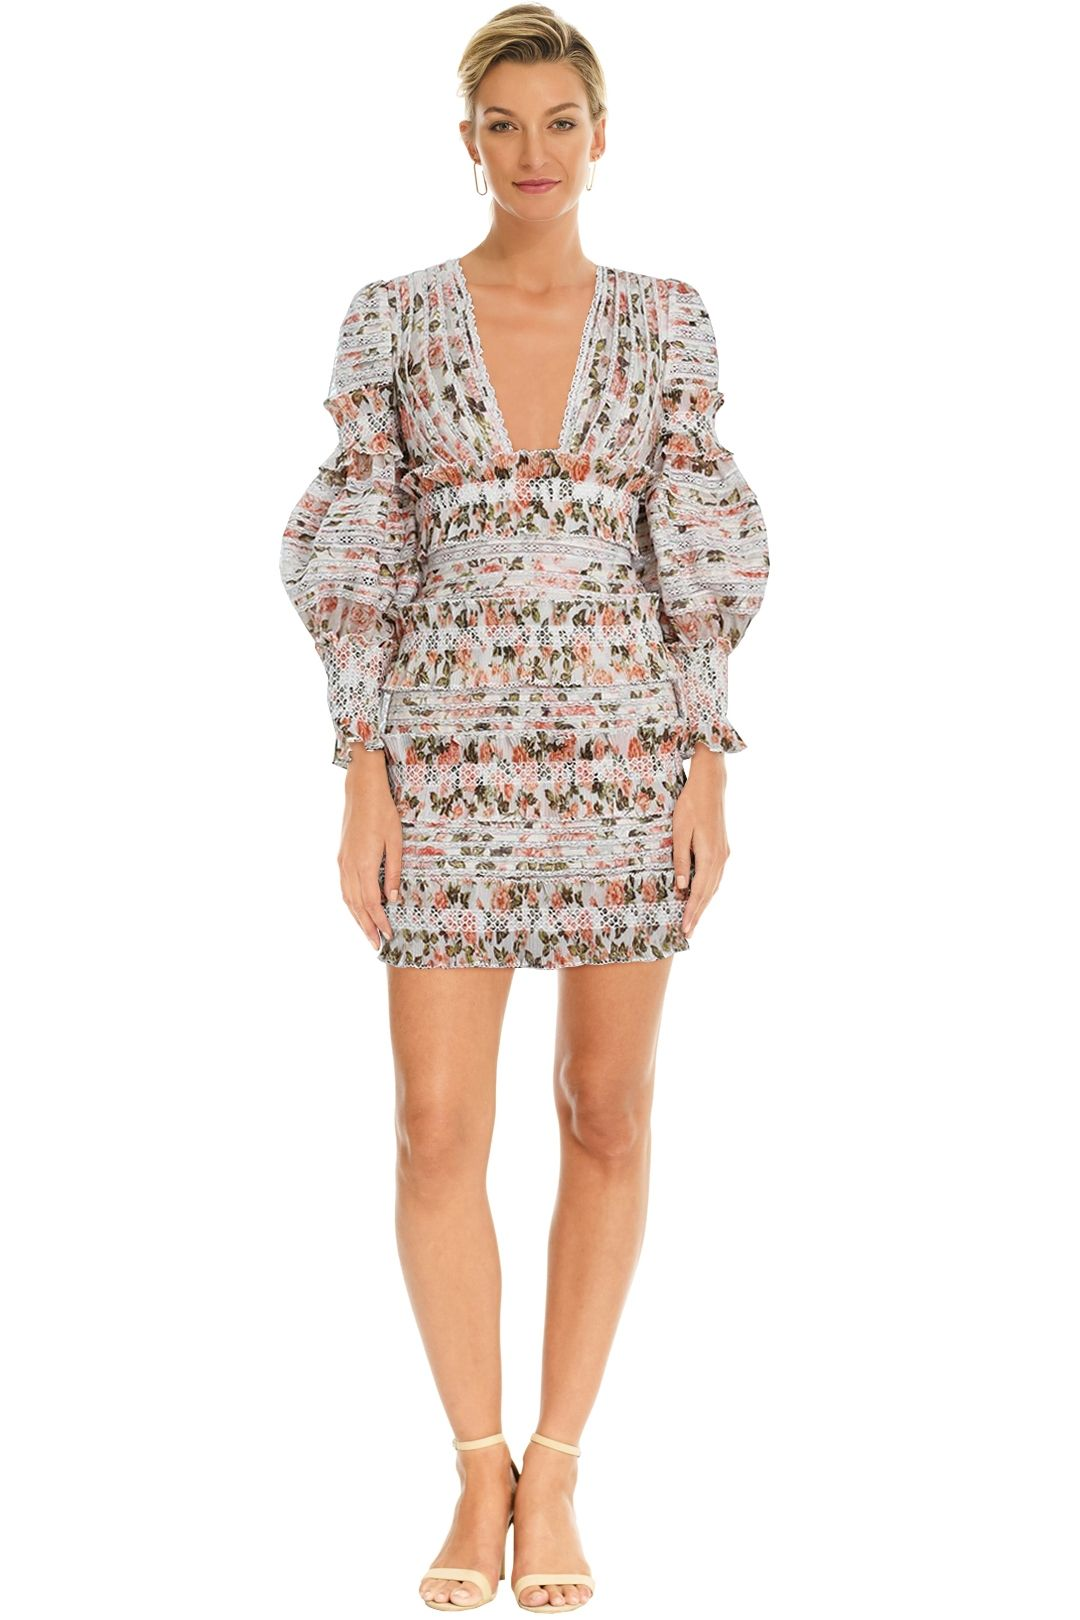 Zimmermann - Radiate Smocked Mini Dress - Peach Floral - Front